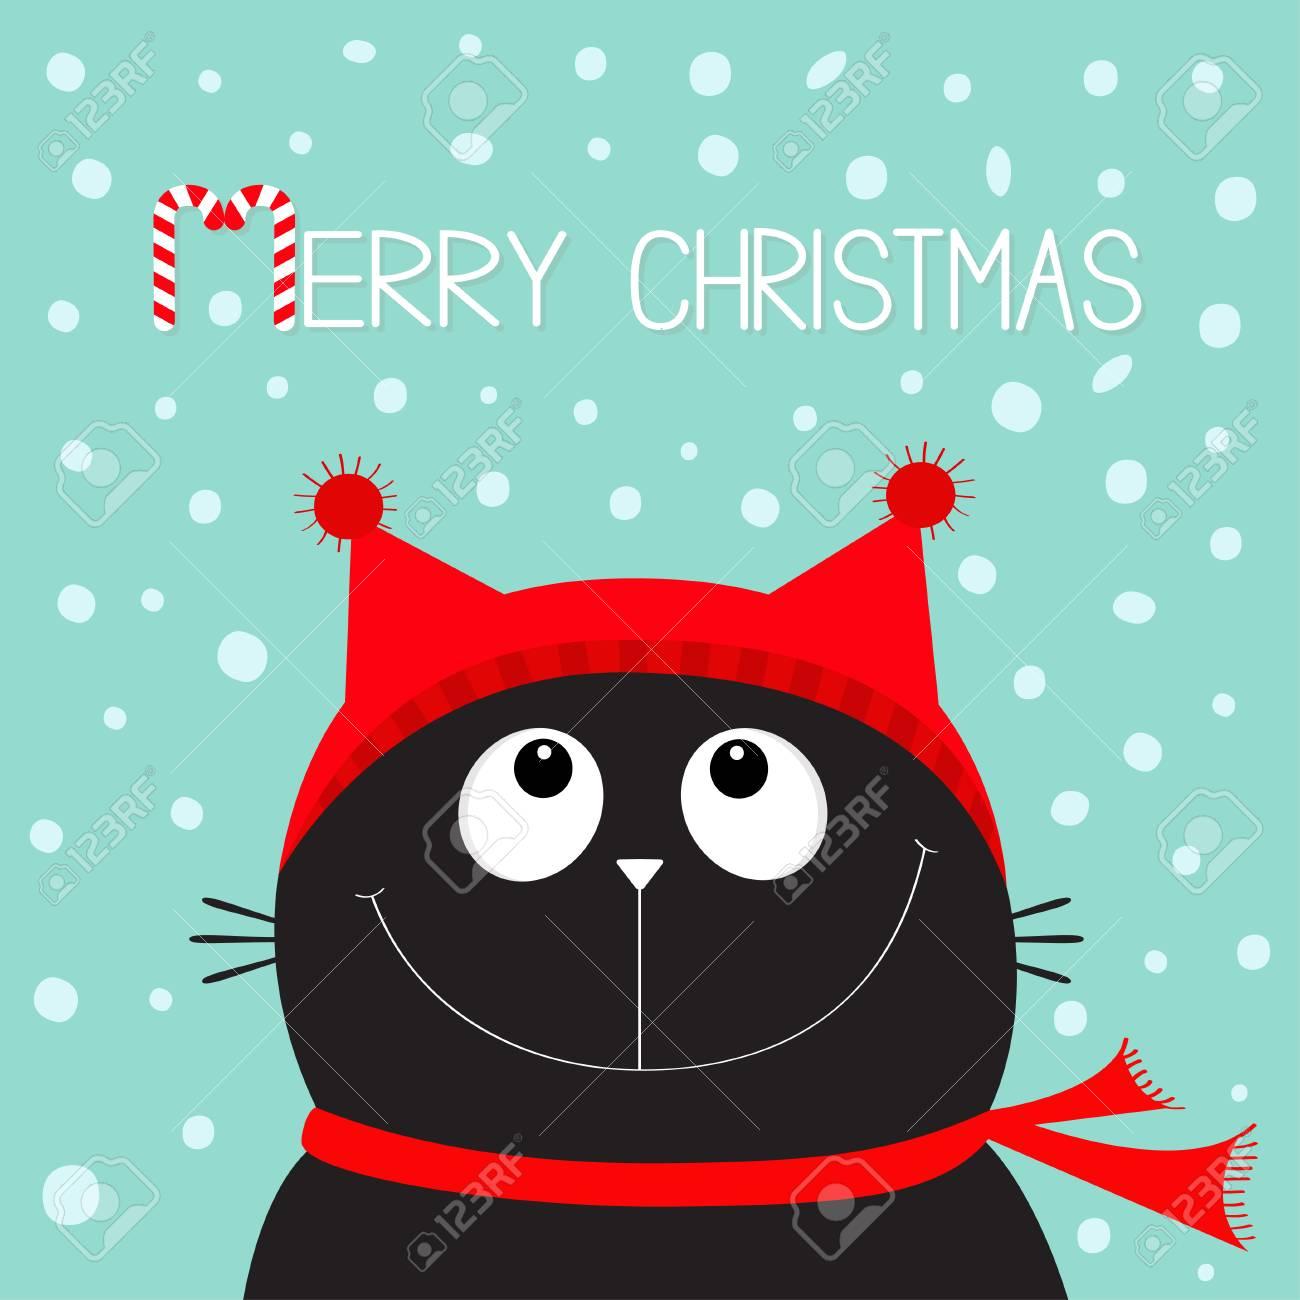 Merry Christmas Candy Cane Text. Black Cat Kitten Head Face ...